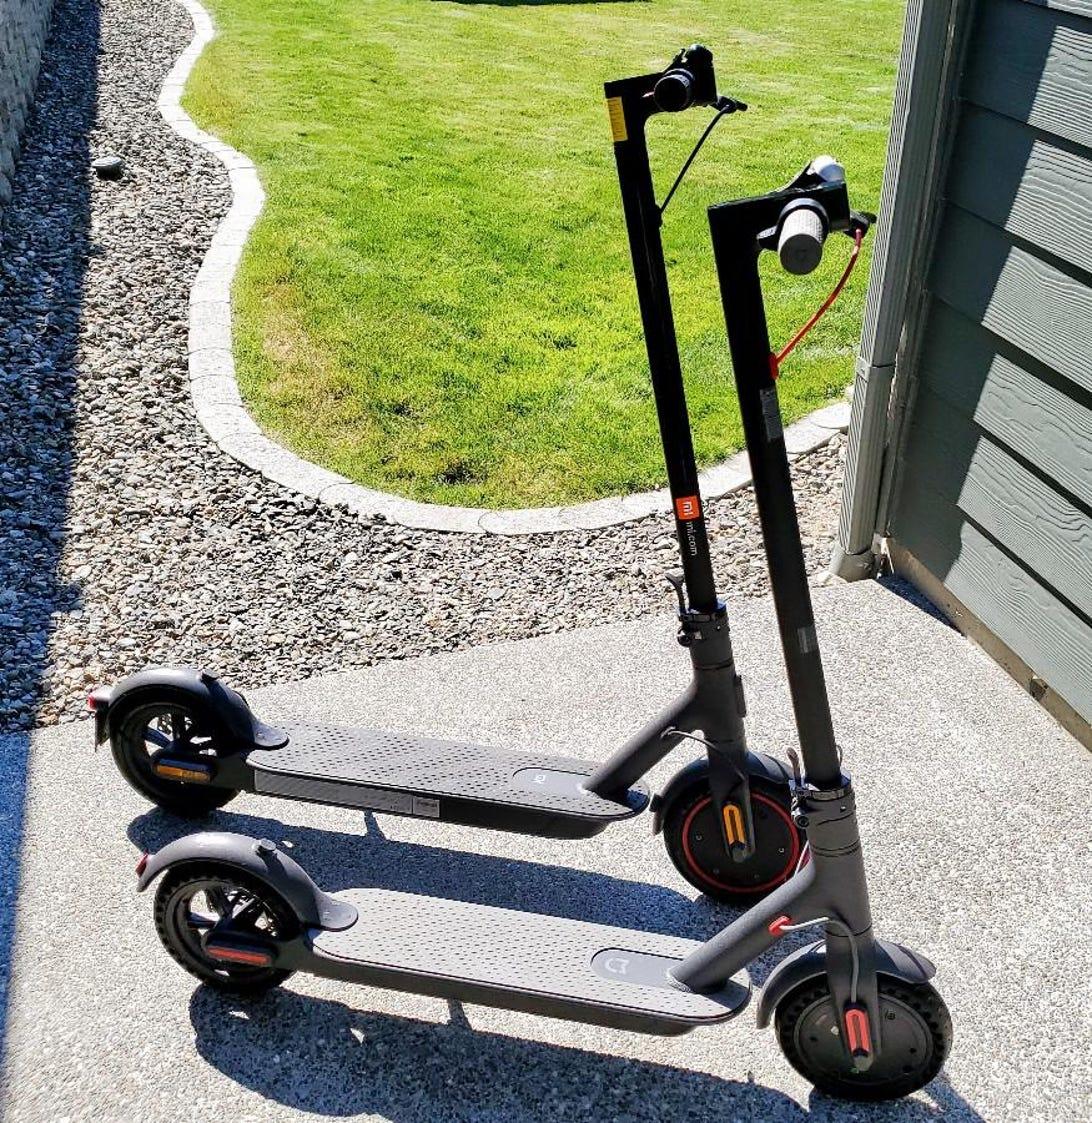 mi-scooter-pro-2-1.jpg